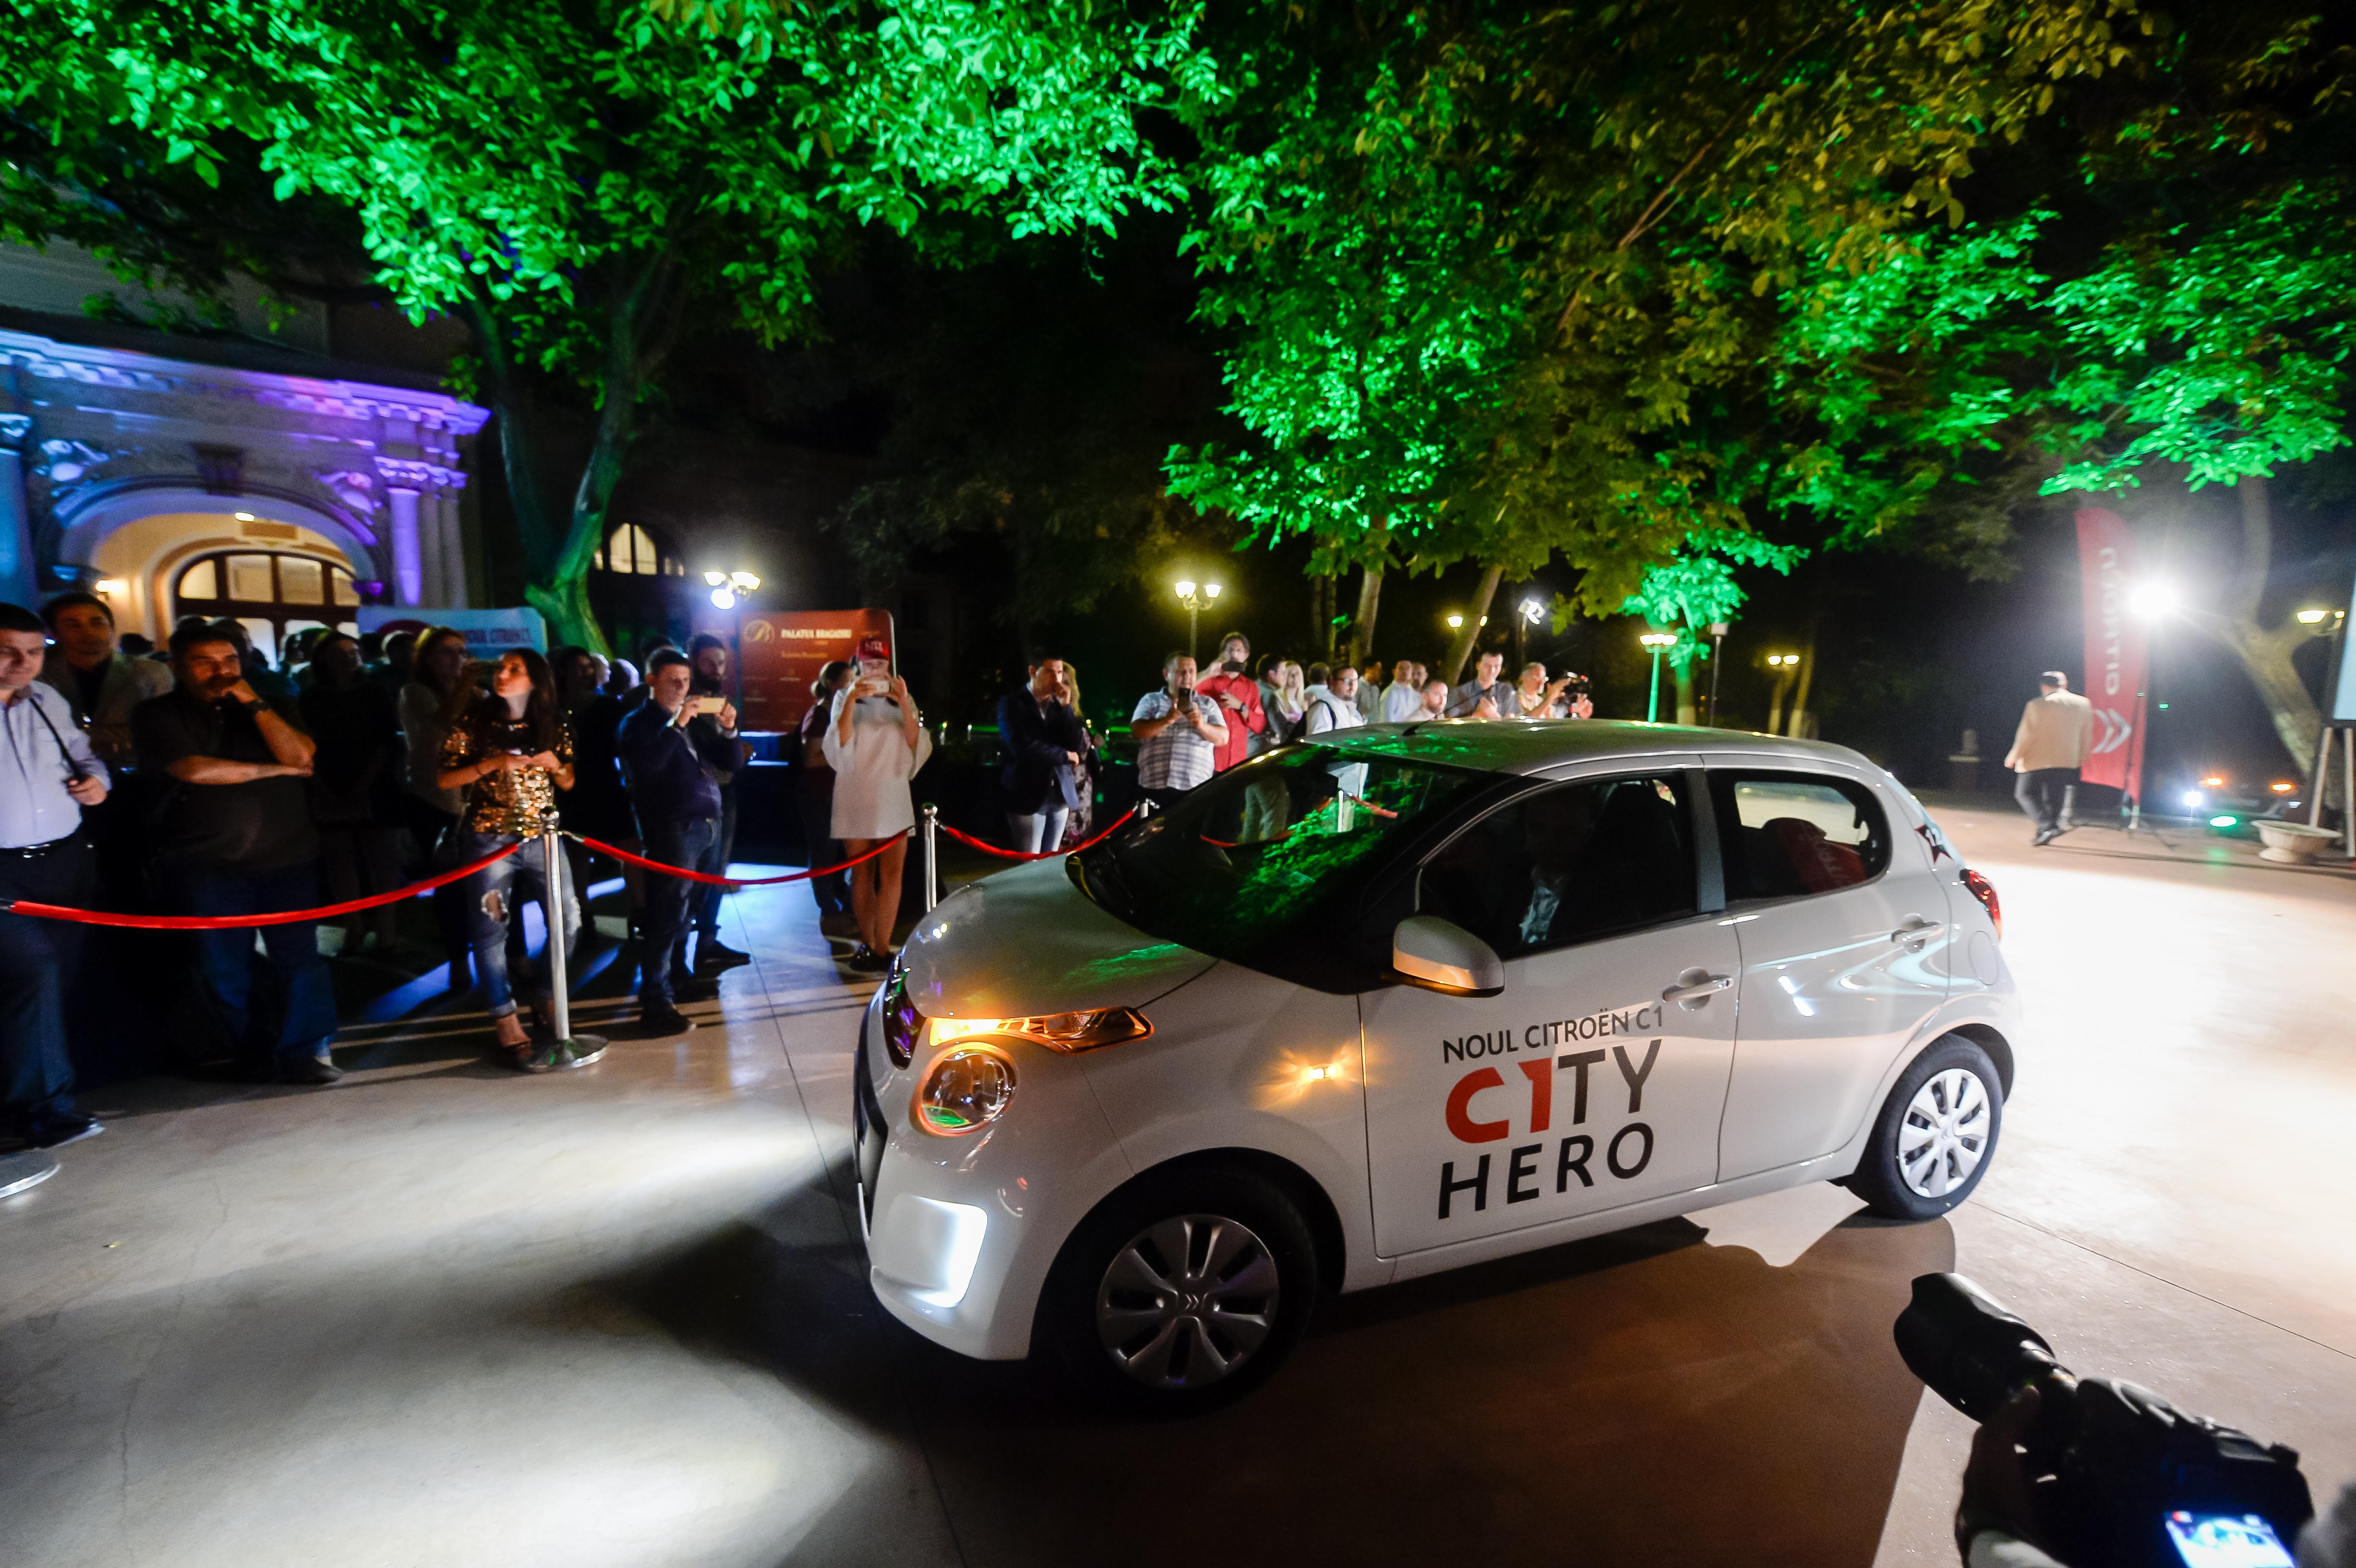 PARTY Citroen C1TY HERO @Palatul Bragadiru